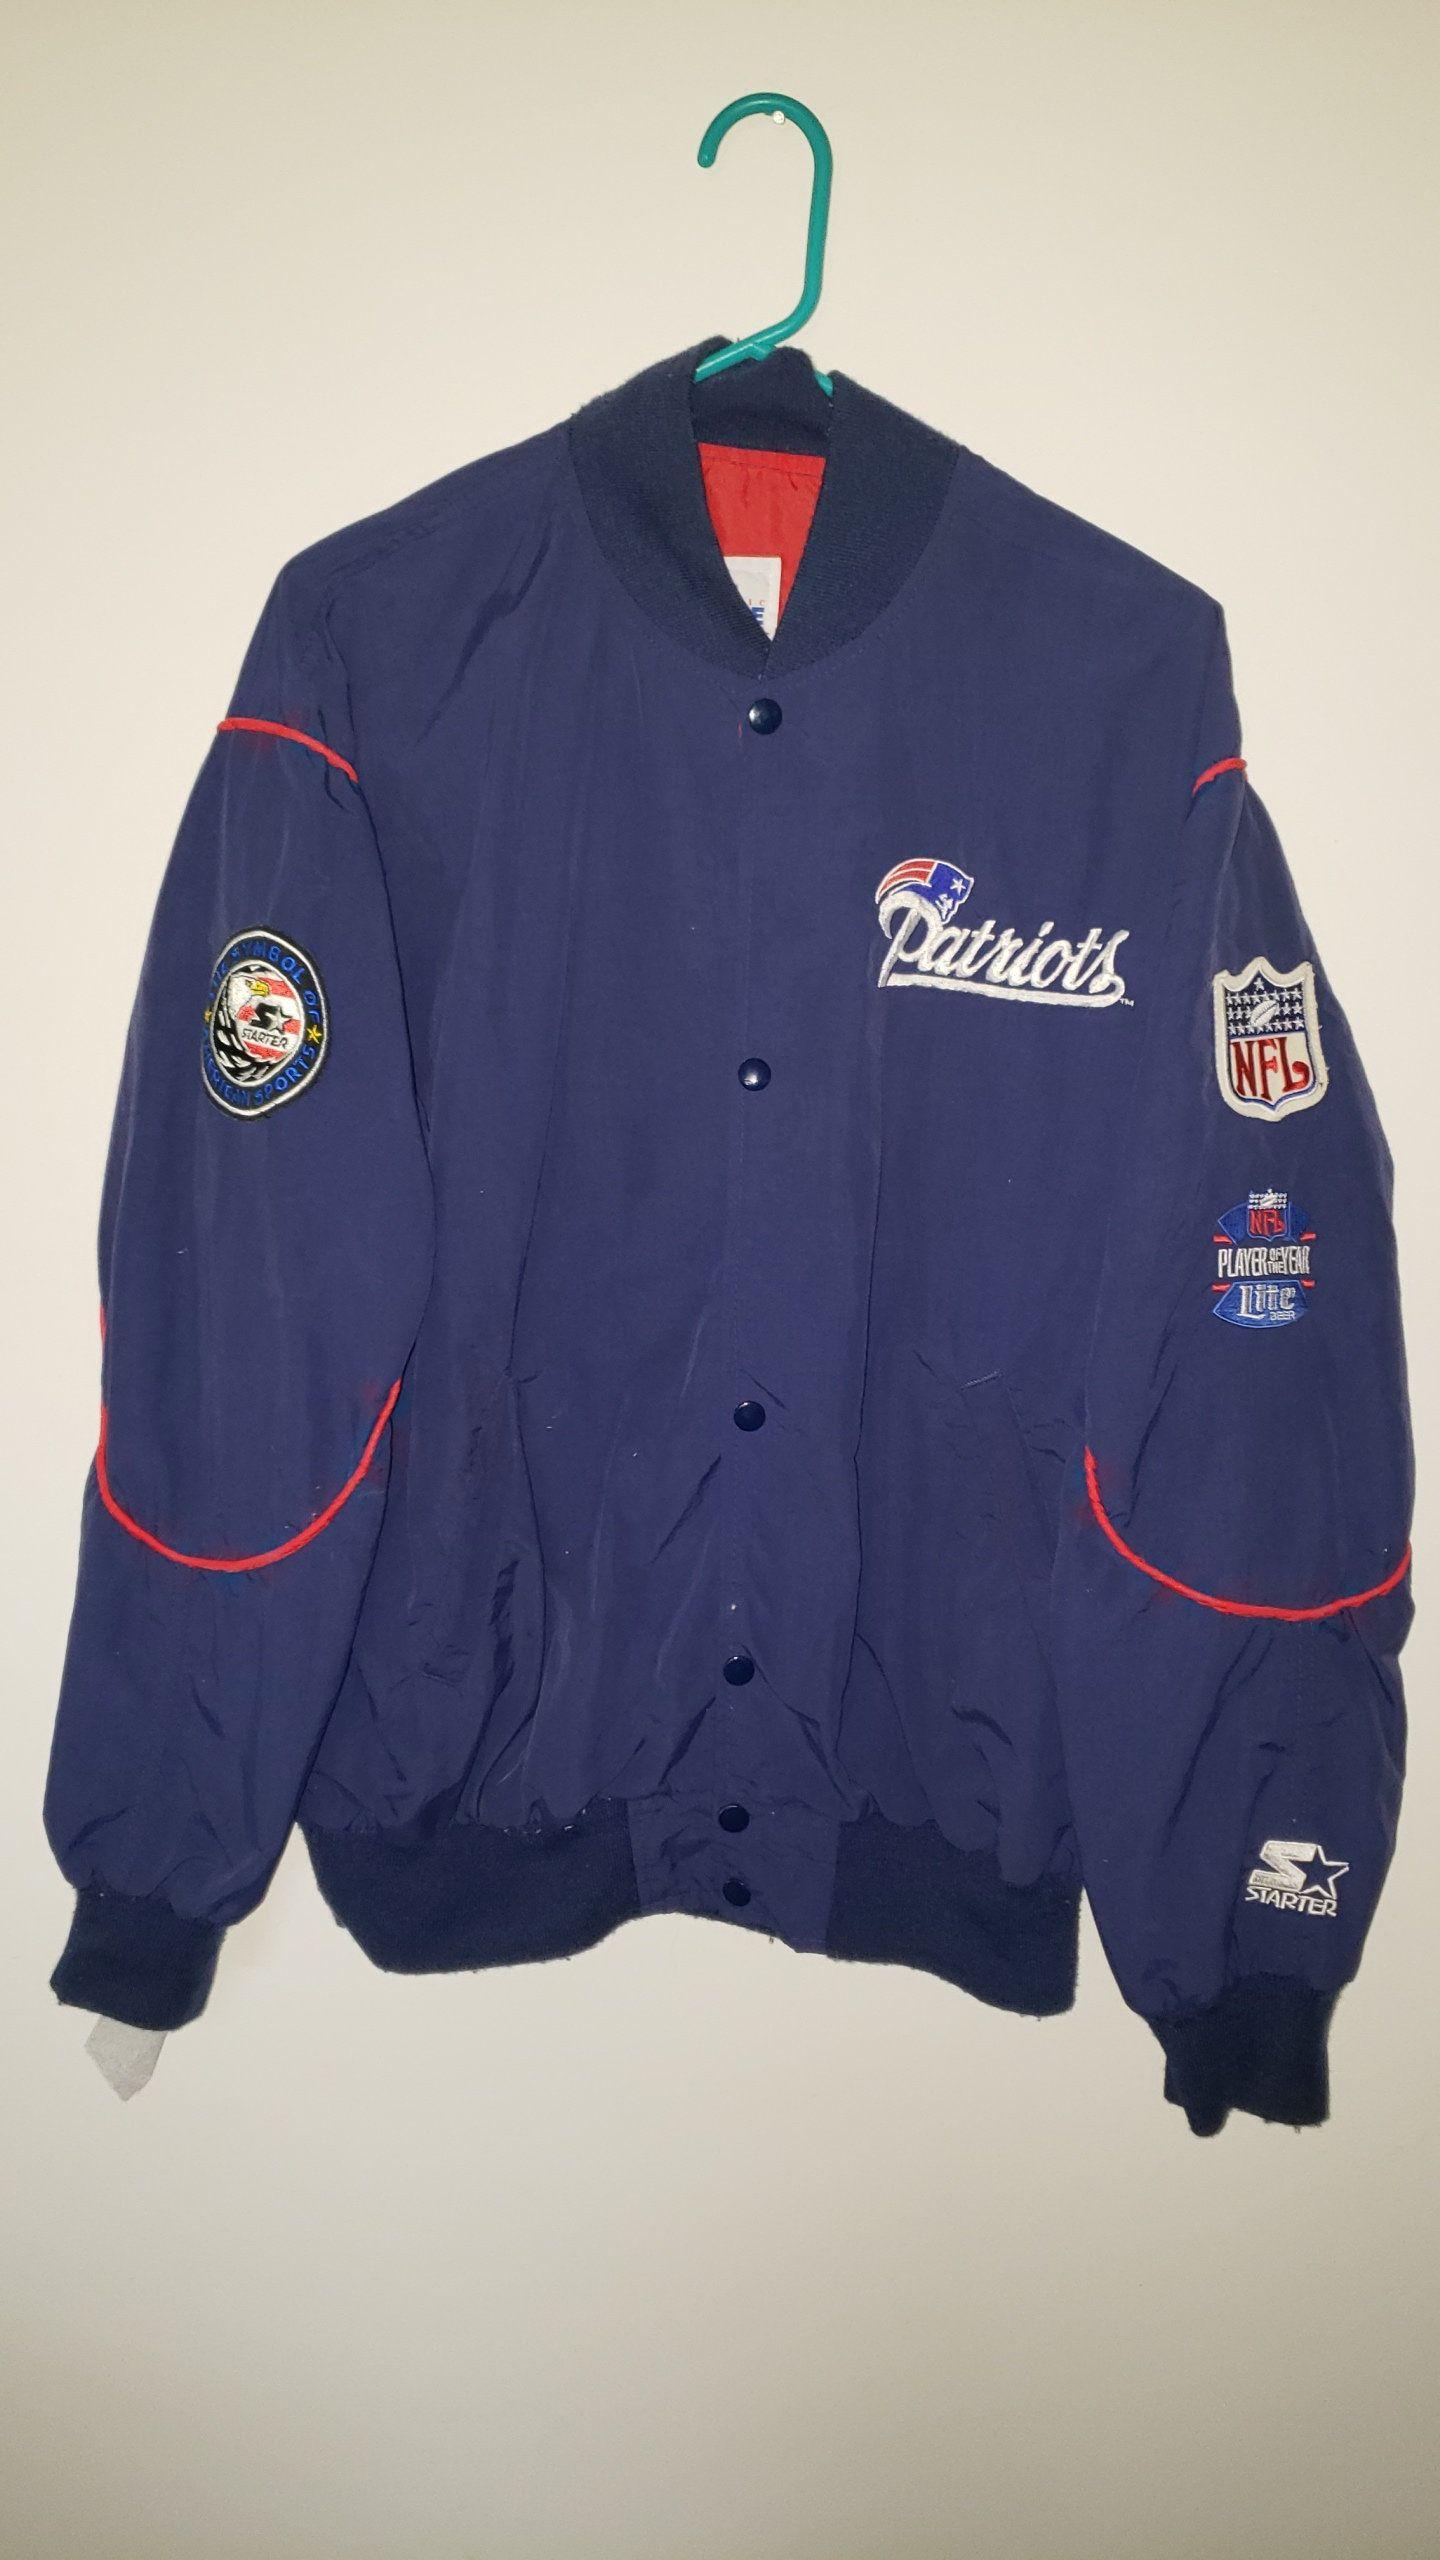 Vintage 90 s Starter NFL New England Patriots Bomber Jacket Windbreaker -  Size Adult XL Spring Winter Cold Weather Gear Trendy Football by  RackRaidersVtg on ... 317e839422